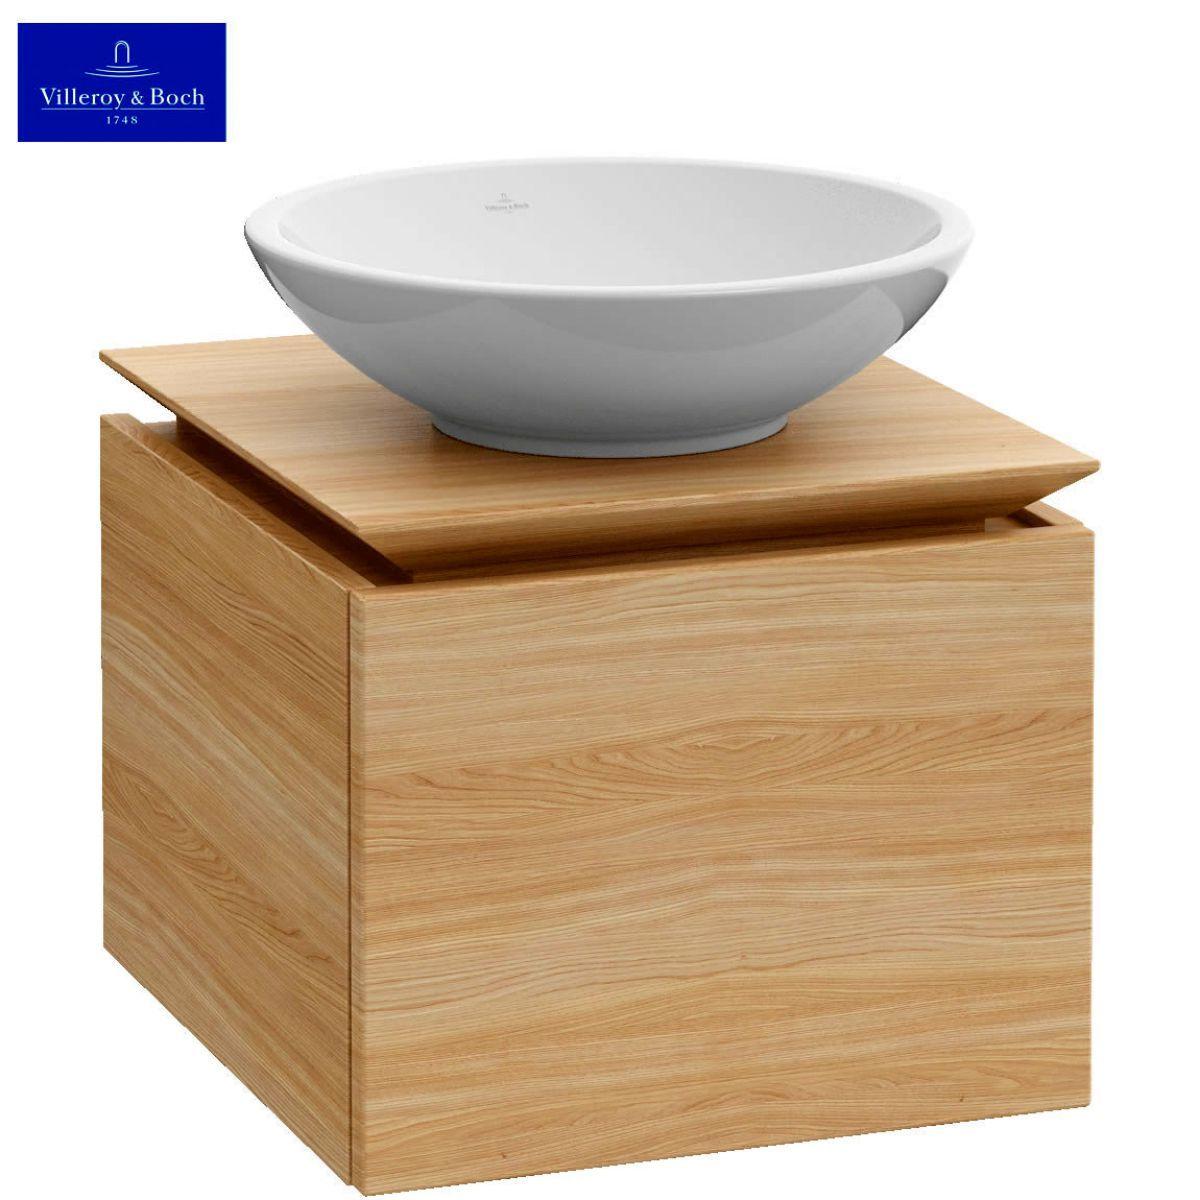 Villeroy & Boch China & Dinnerware for sale | eBay